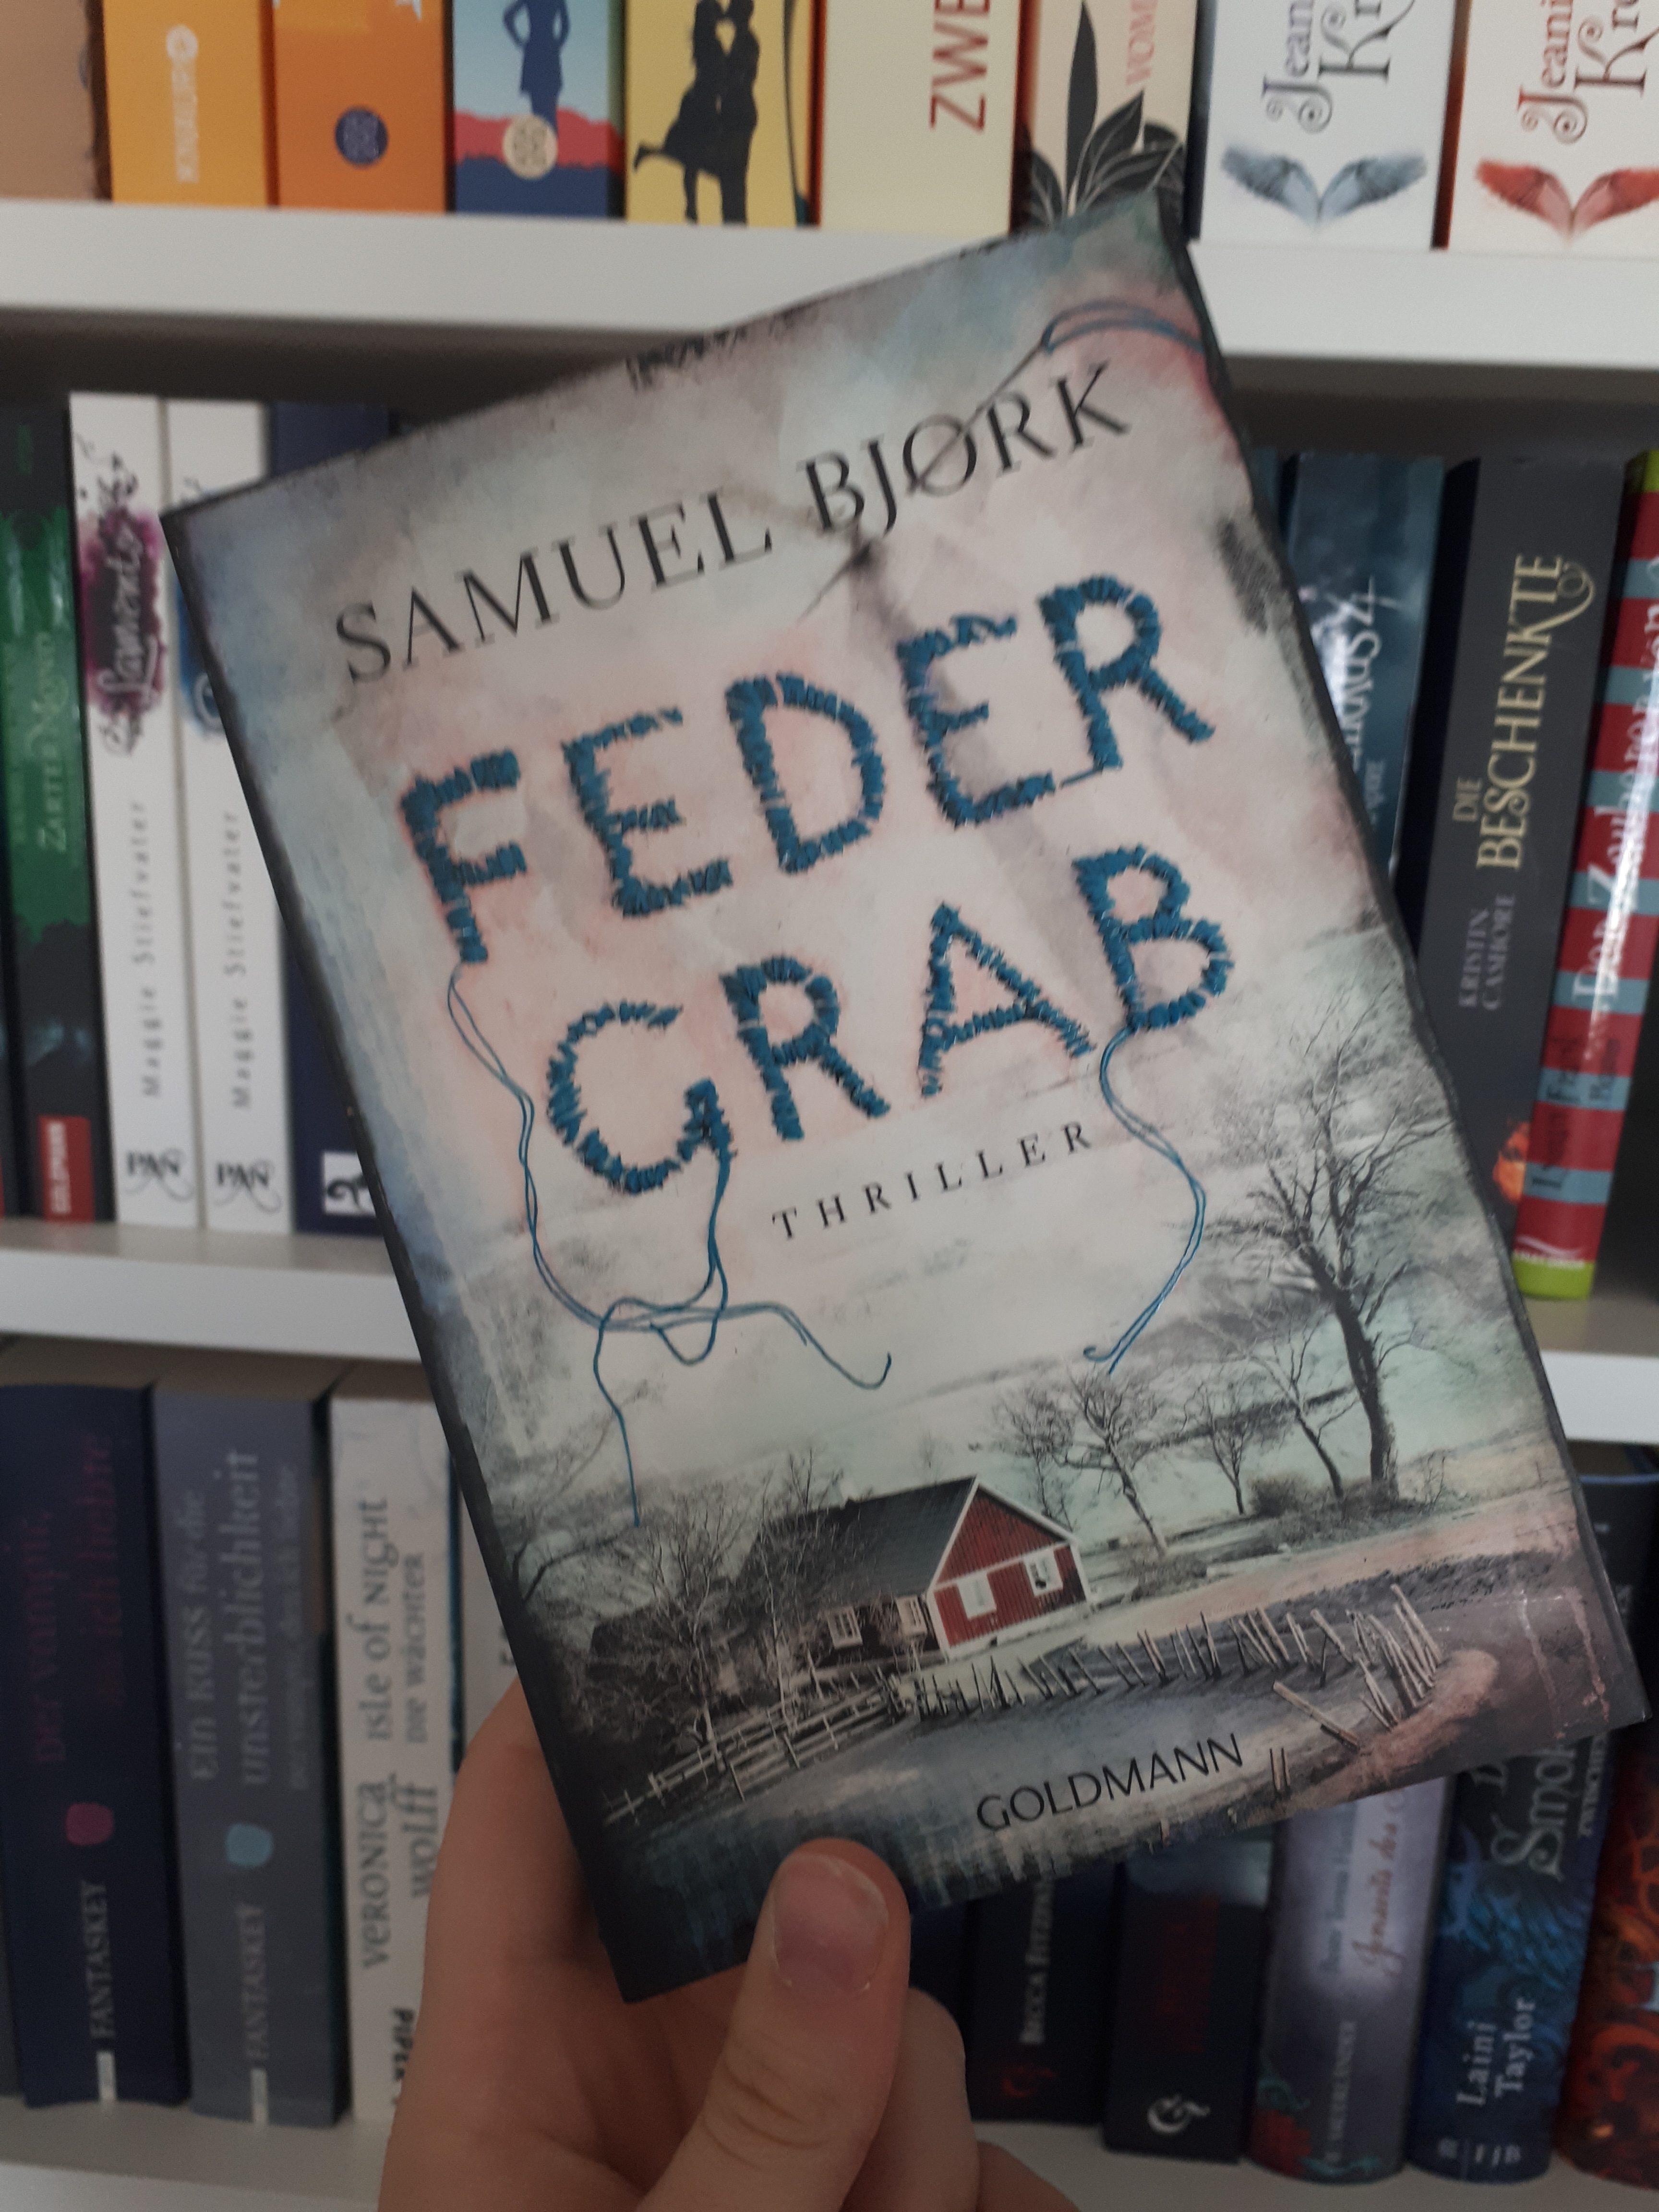 [Werbung] Federgrab – Samuel Bjørk